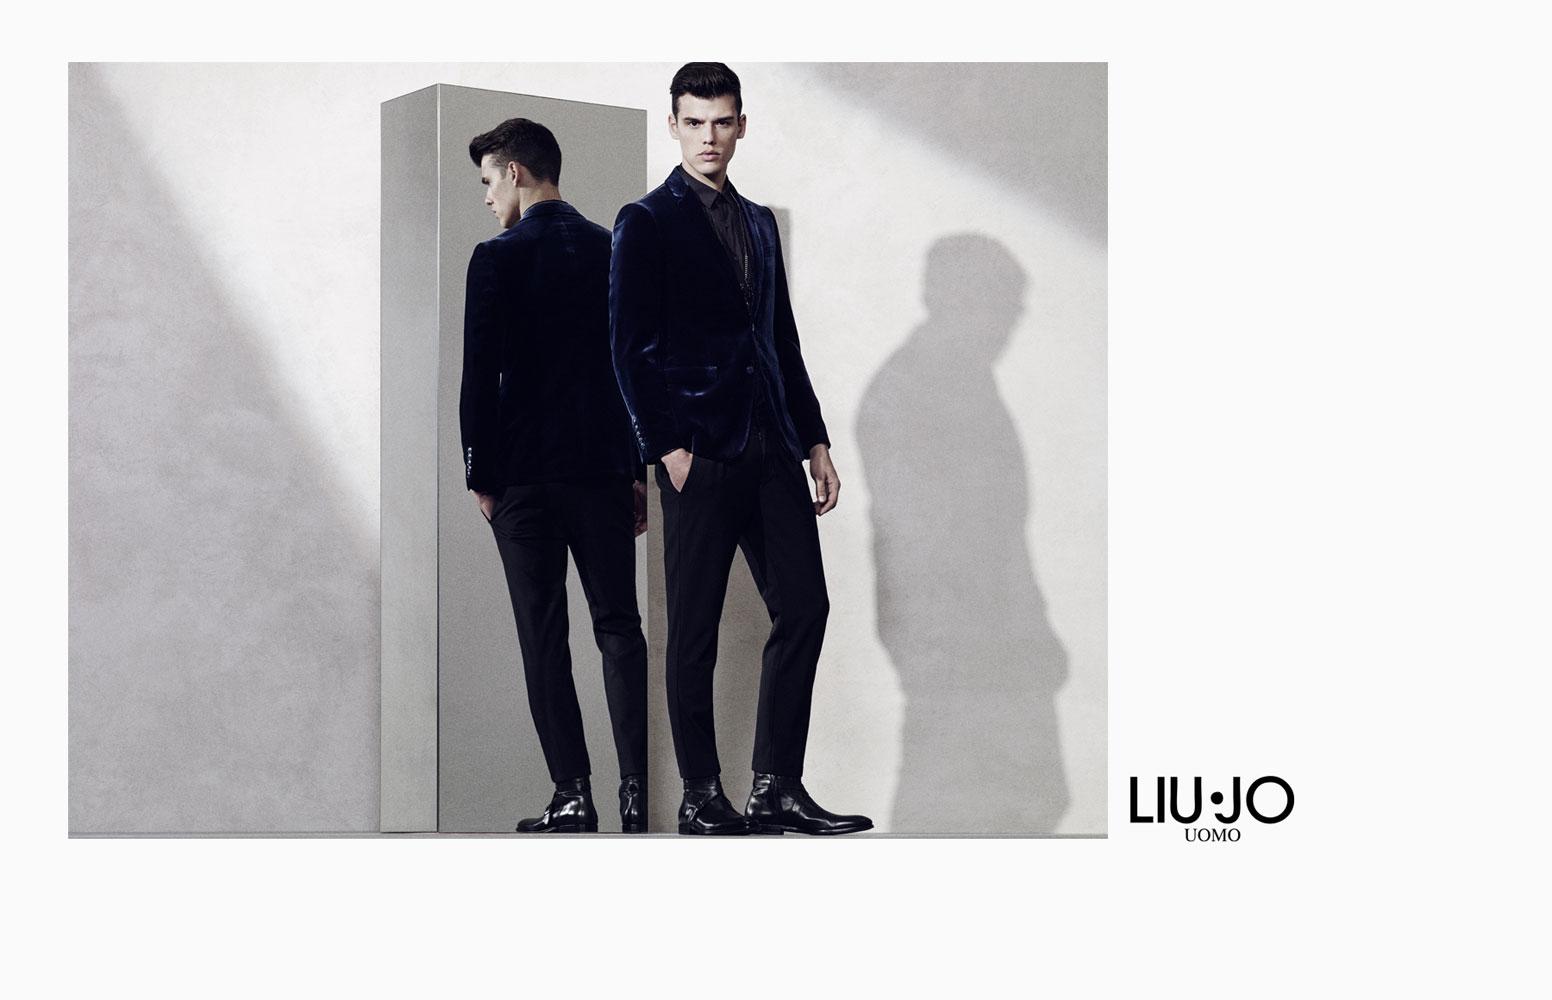 new styles 52725 29bb5 WM Artist Management LIUJO UOMO